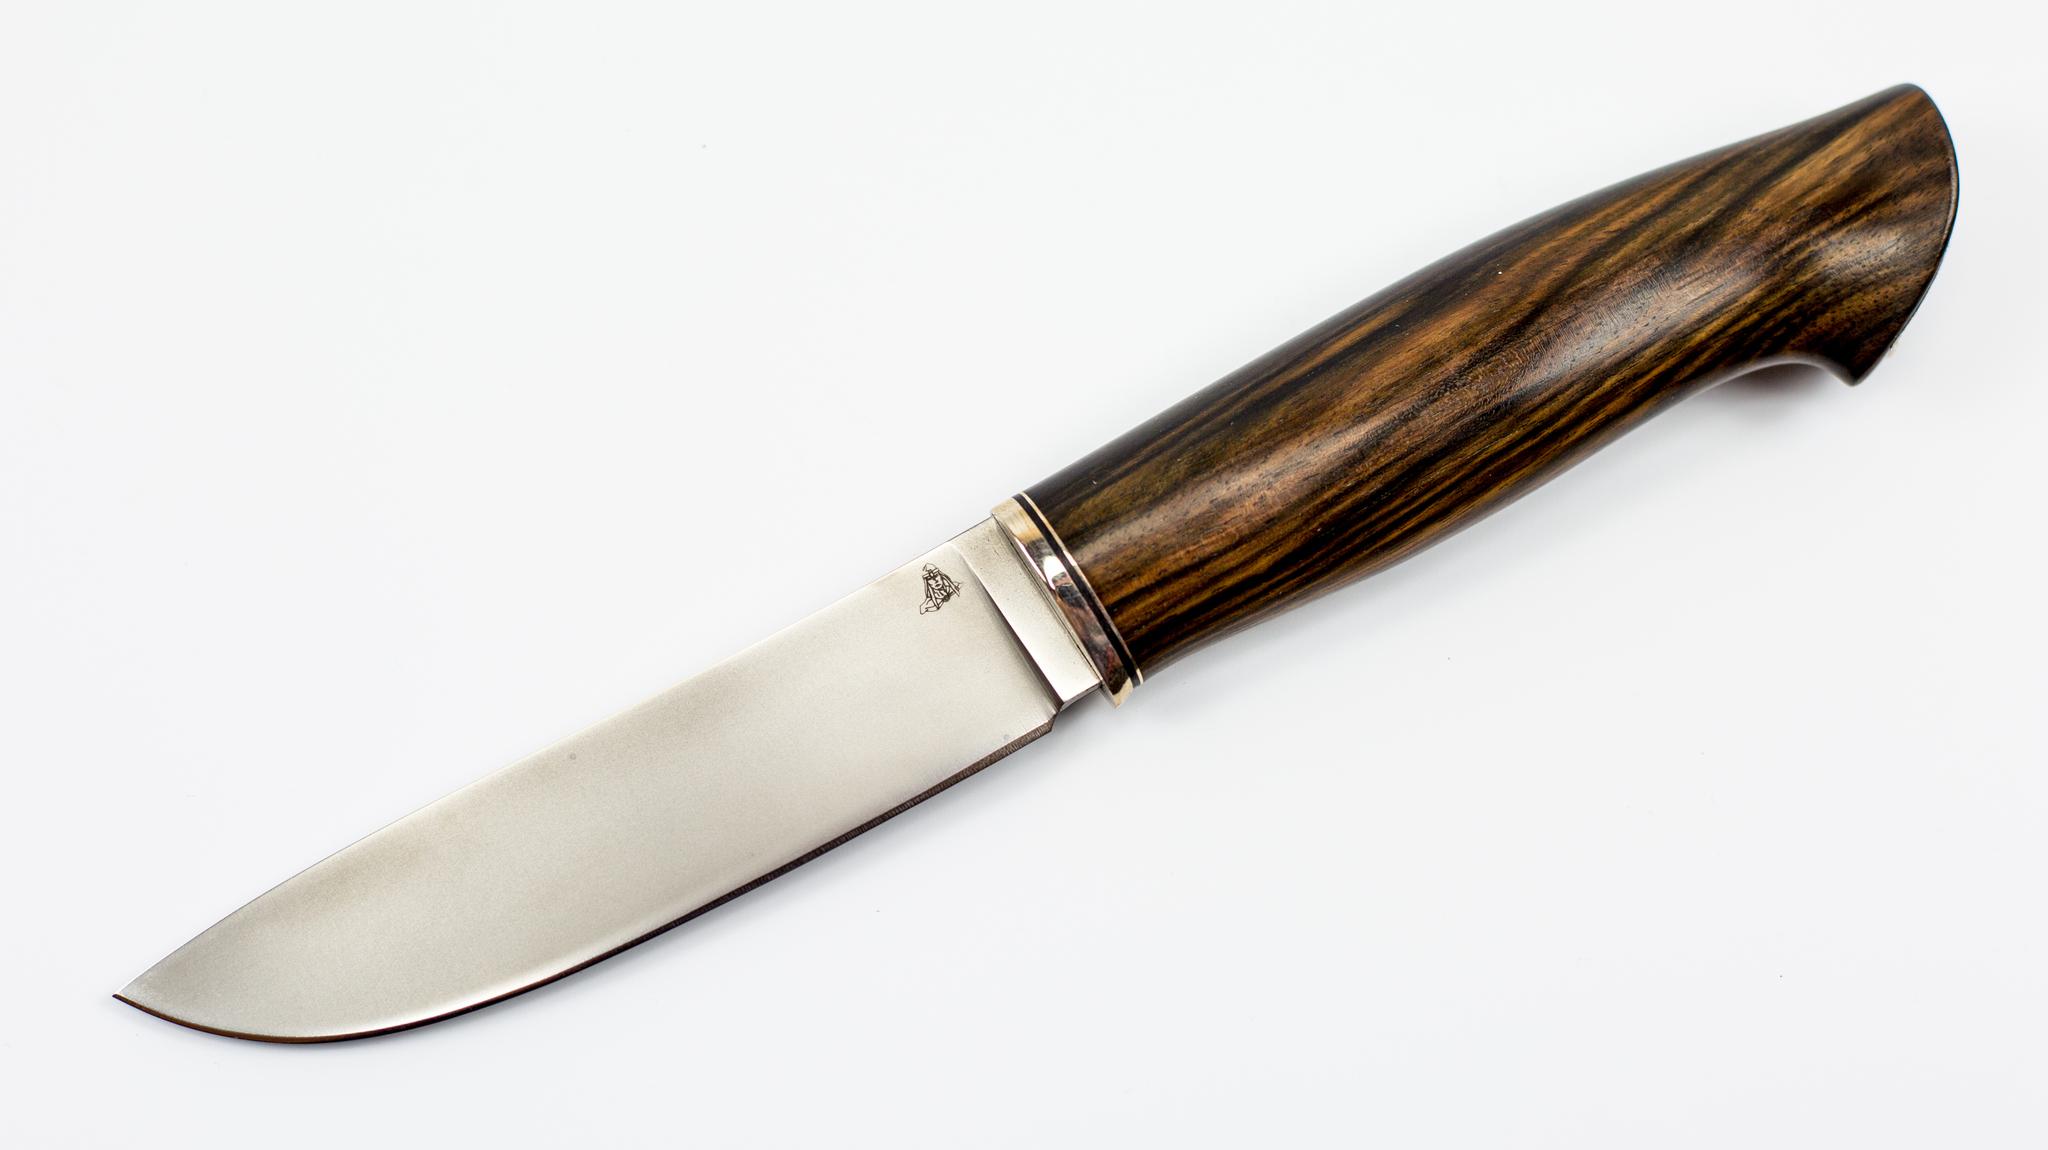 Нож Скинер, CPM S30V, эбеновое деревоНожи Ворсма<br>Нож Скинер, CPM S30V, эбеновое дерево<br>